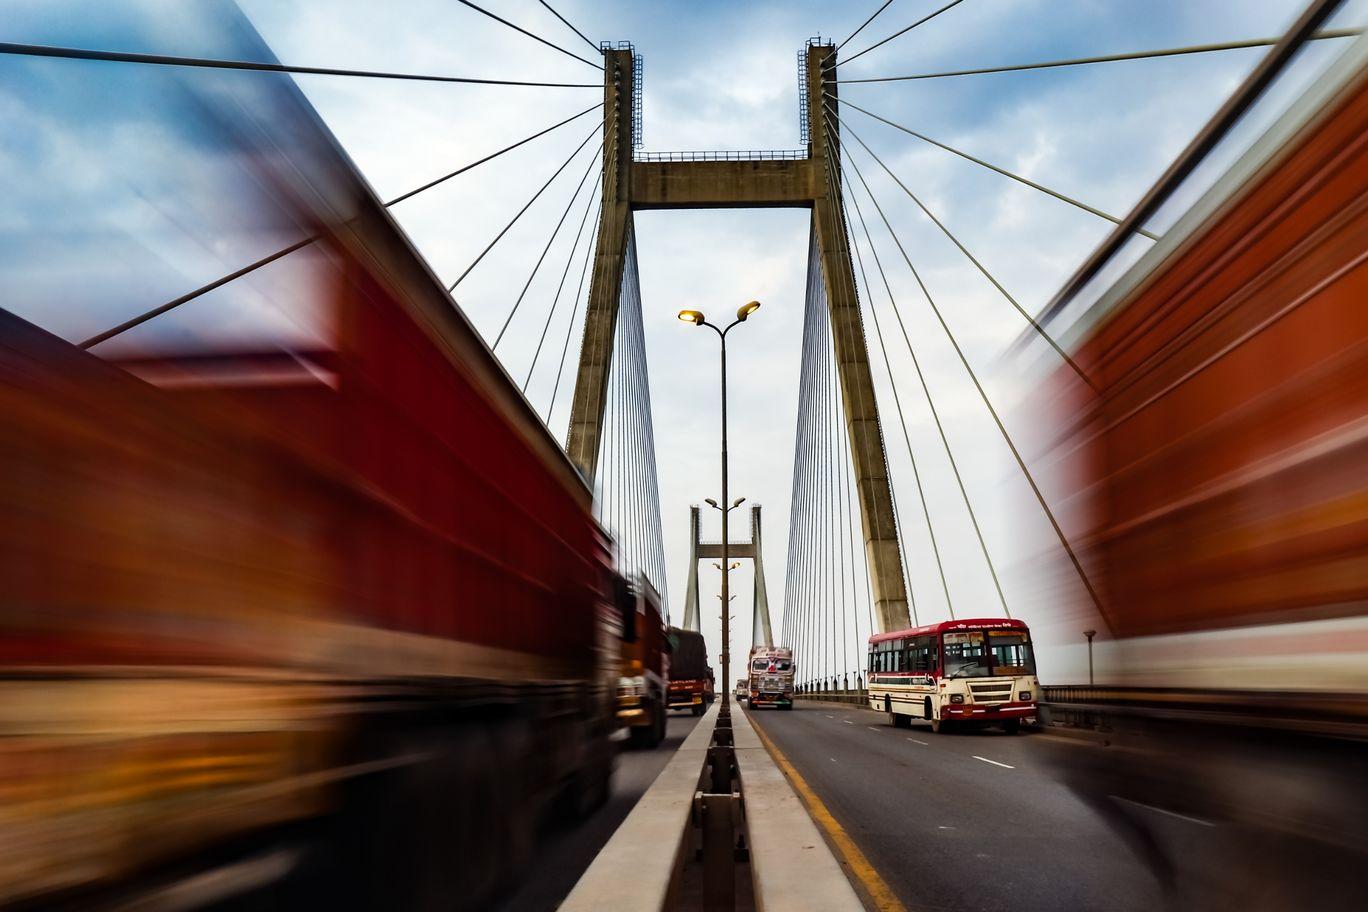 Photo of New Yamuna Bridge By Allahabadi_Photographer